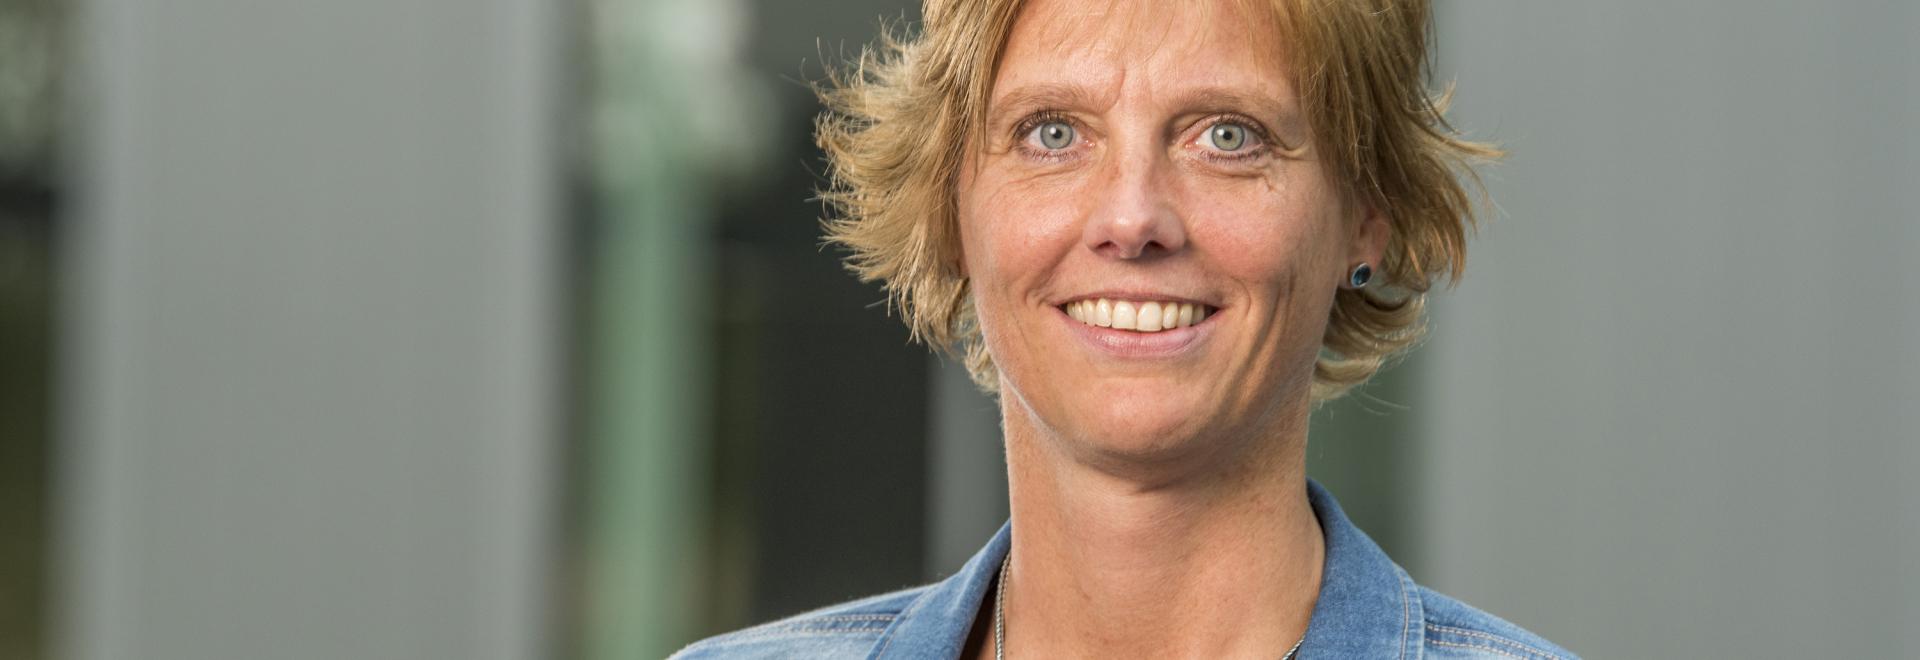 Sustainability consultant Michela van Kampen